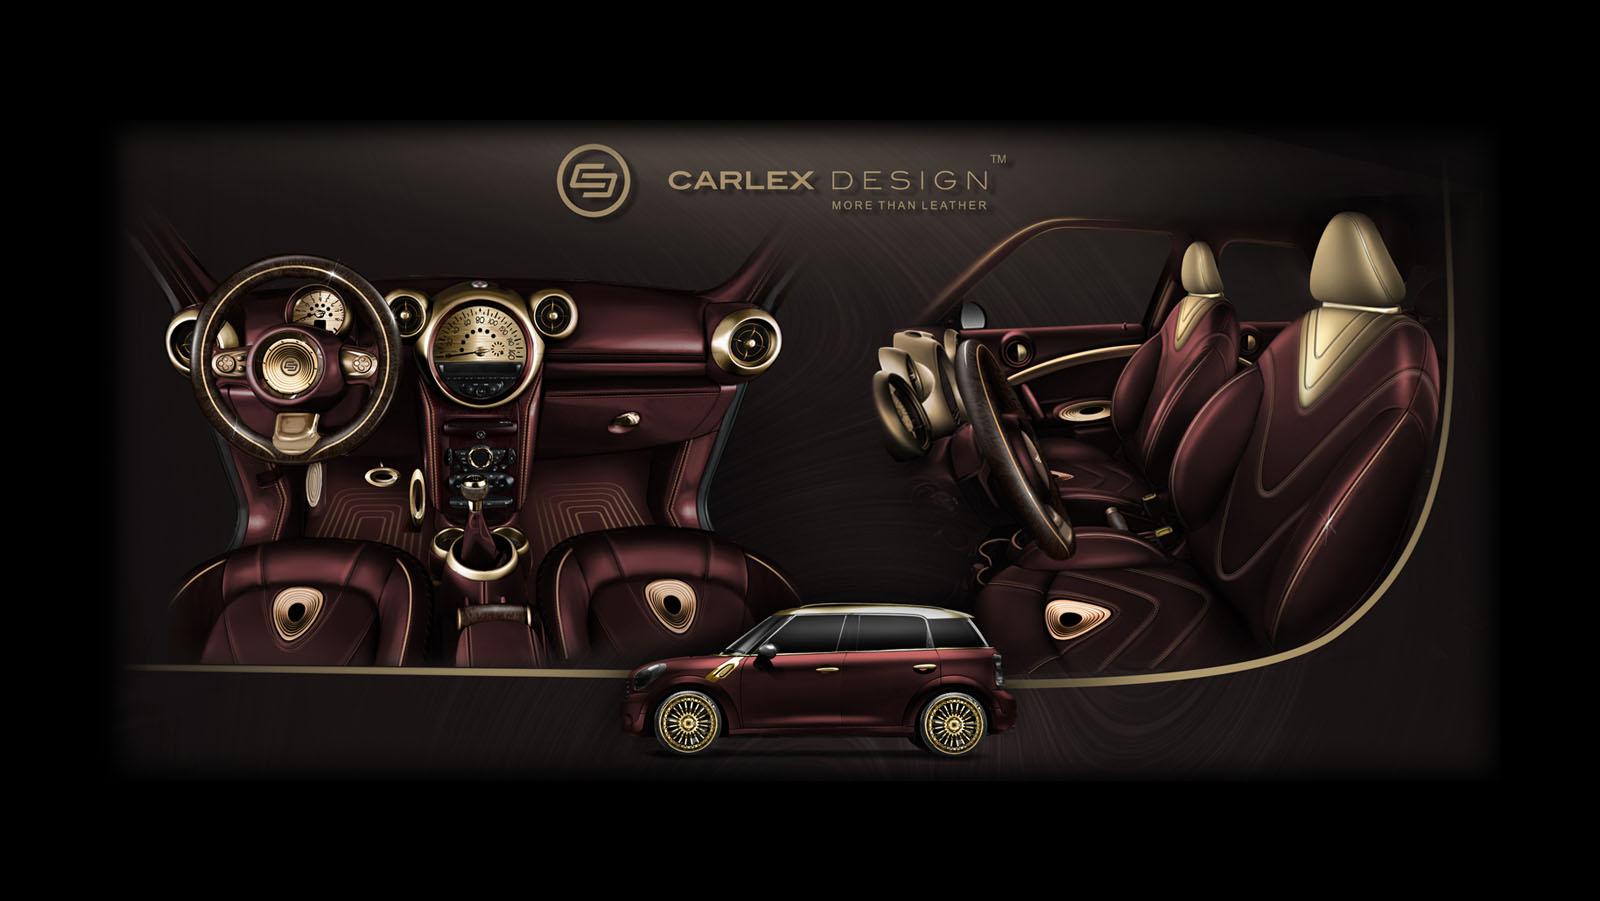 Carlex Design Previews New MINI Countryman Project ...